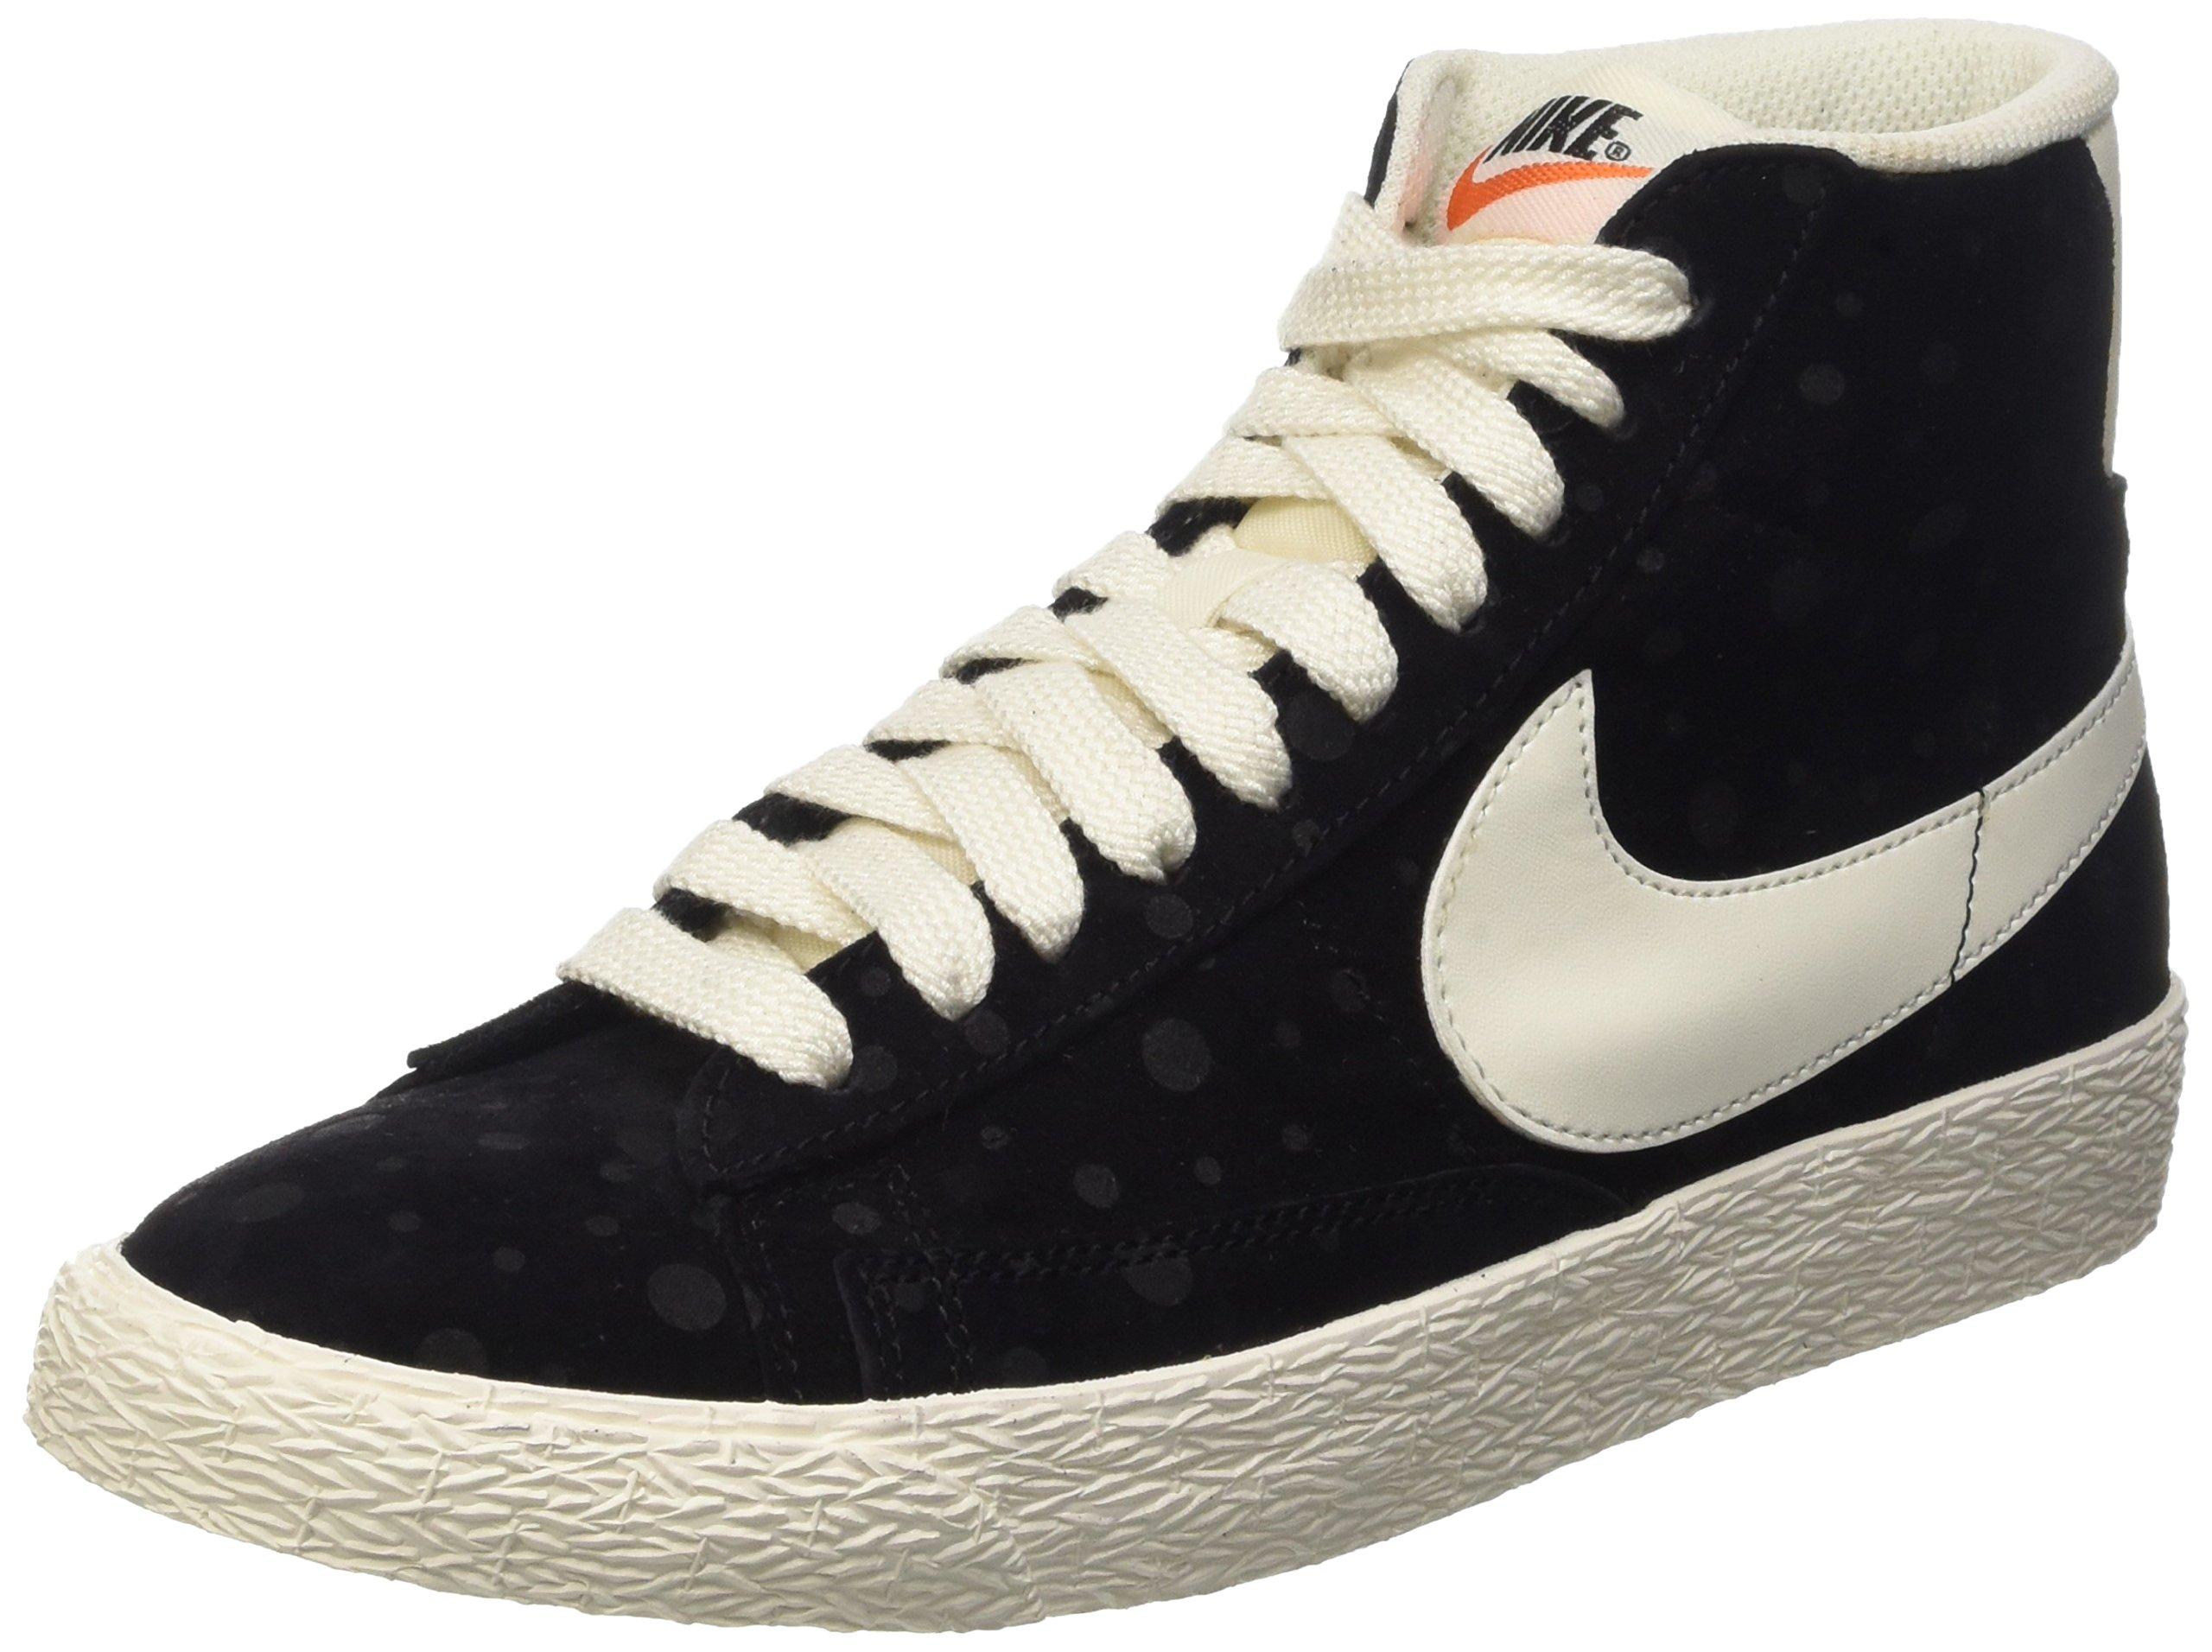 Nike Women's Blazer Mid Suede Vintage Black/White 518171-015 (SIZE: 8) by NIKE (Image #1)